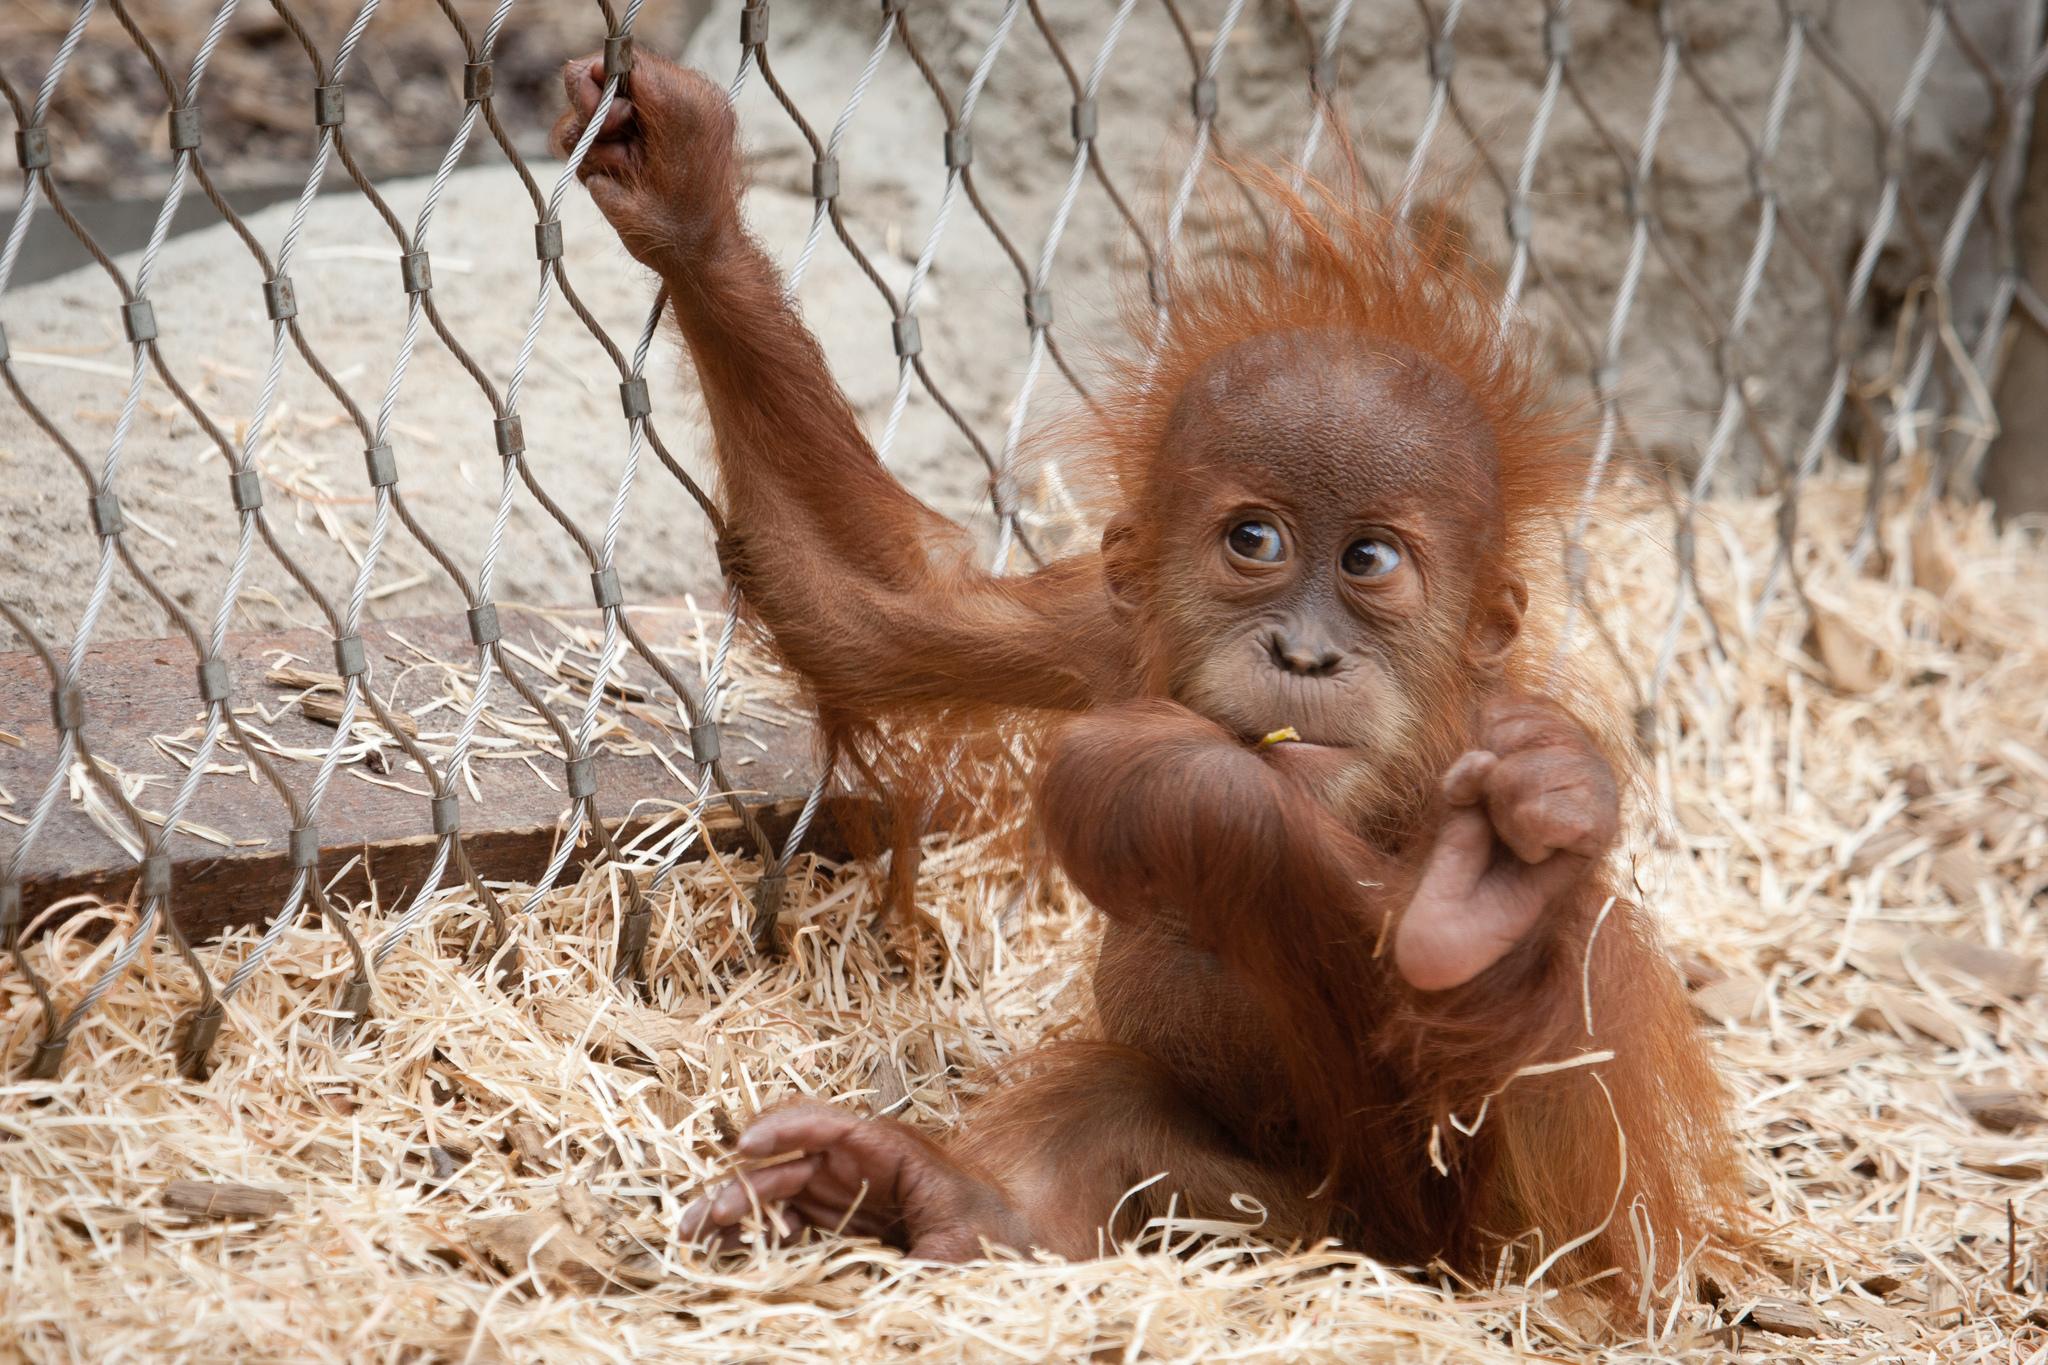 Orangutan Hd Wallpaper Background Image 2048x1365 Id432381